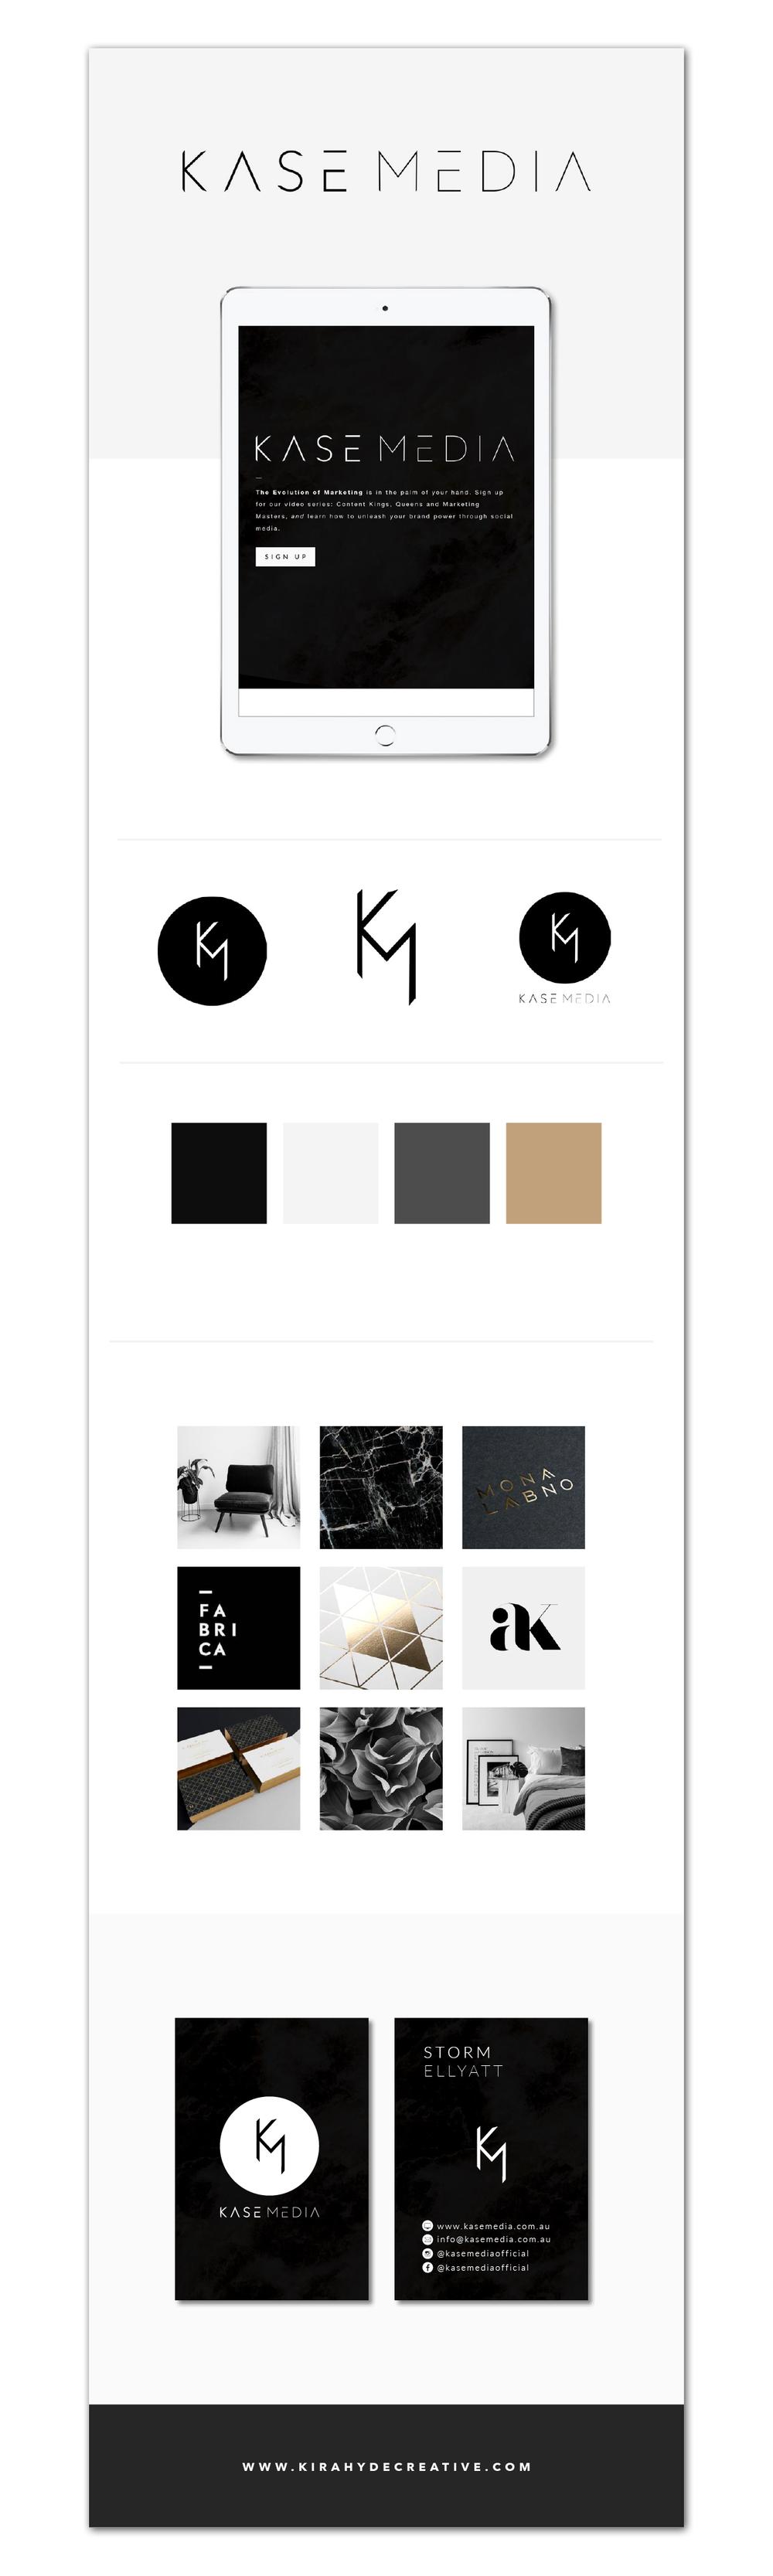 Kase Media Brand Board - Kira Hyde Creative Portfolio